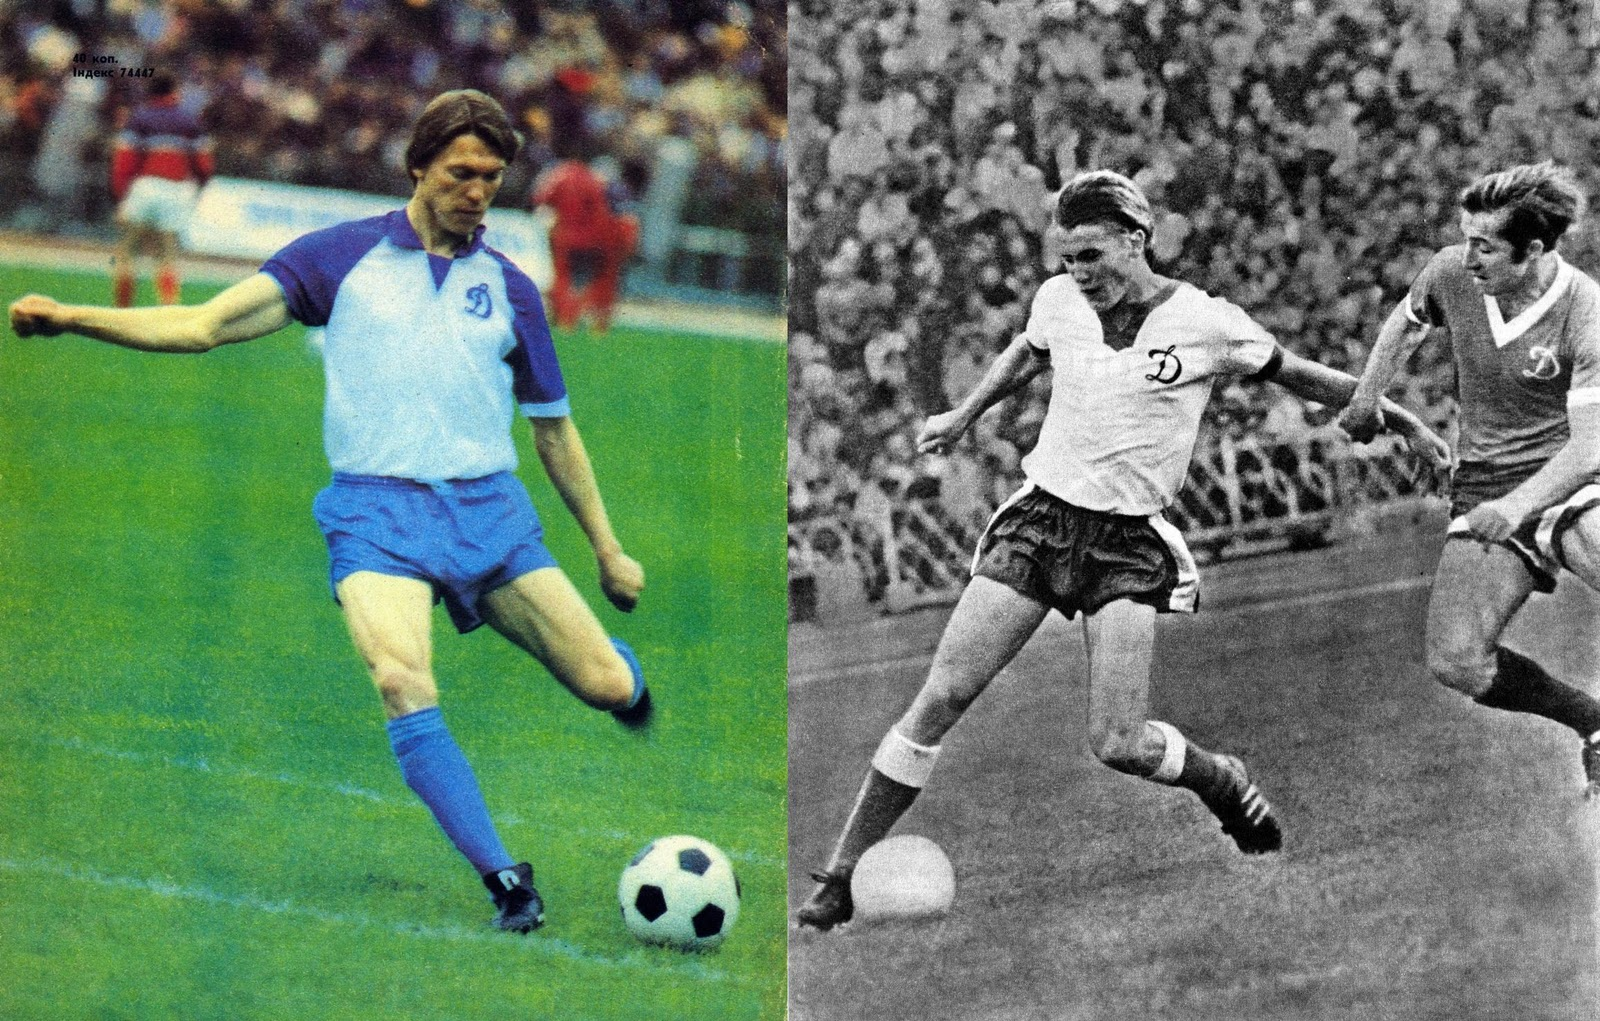 FRITZ THE FLOOD: Oleg Blokhin farewell match 1989 USSR Rest of the World